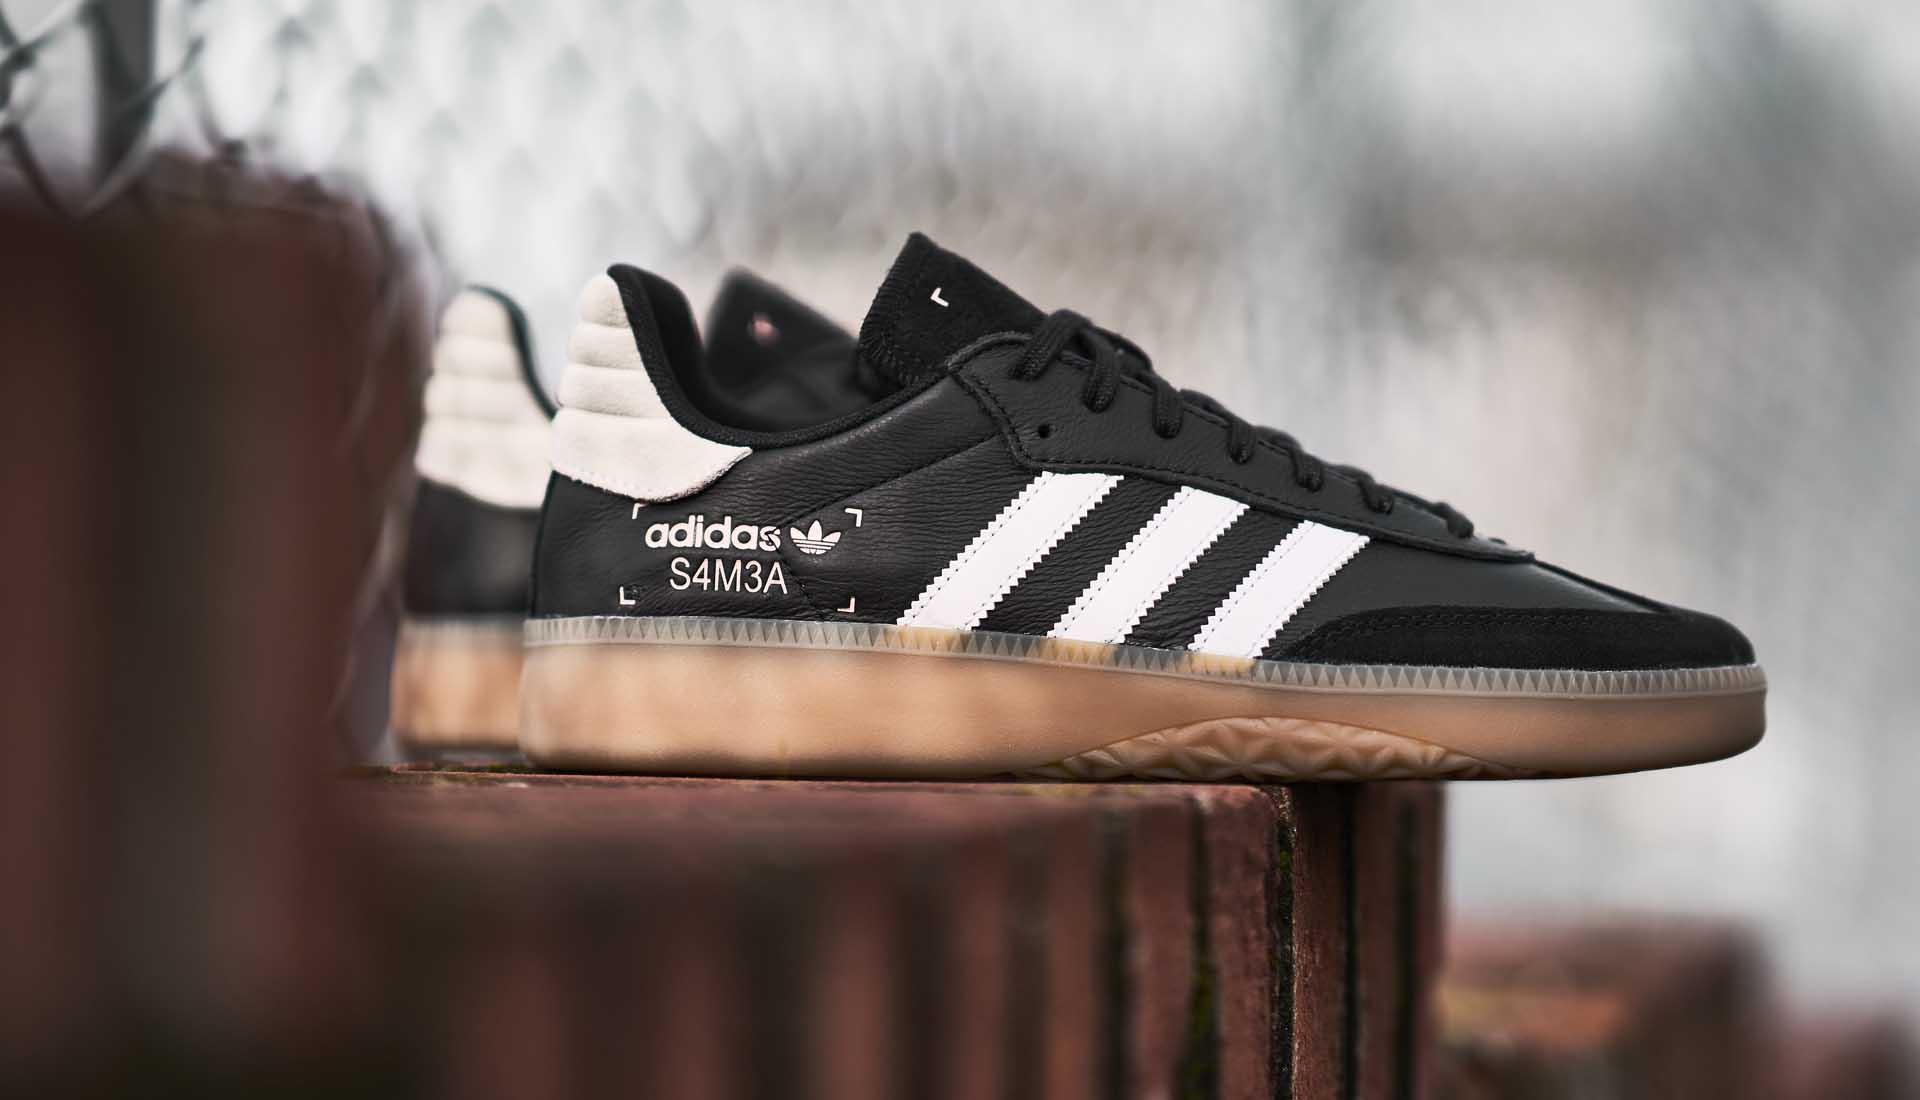 wholesale online wholesale dealer meet Closer Look at the adidas Originals Samba RM Boost - SoccerBible